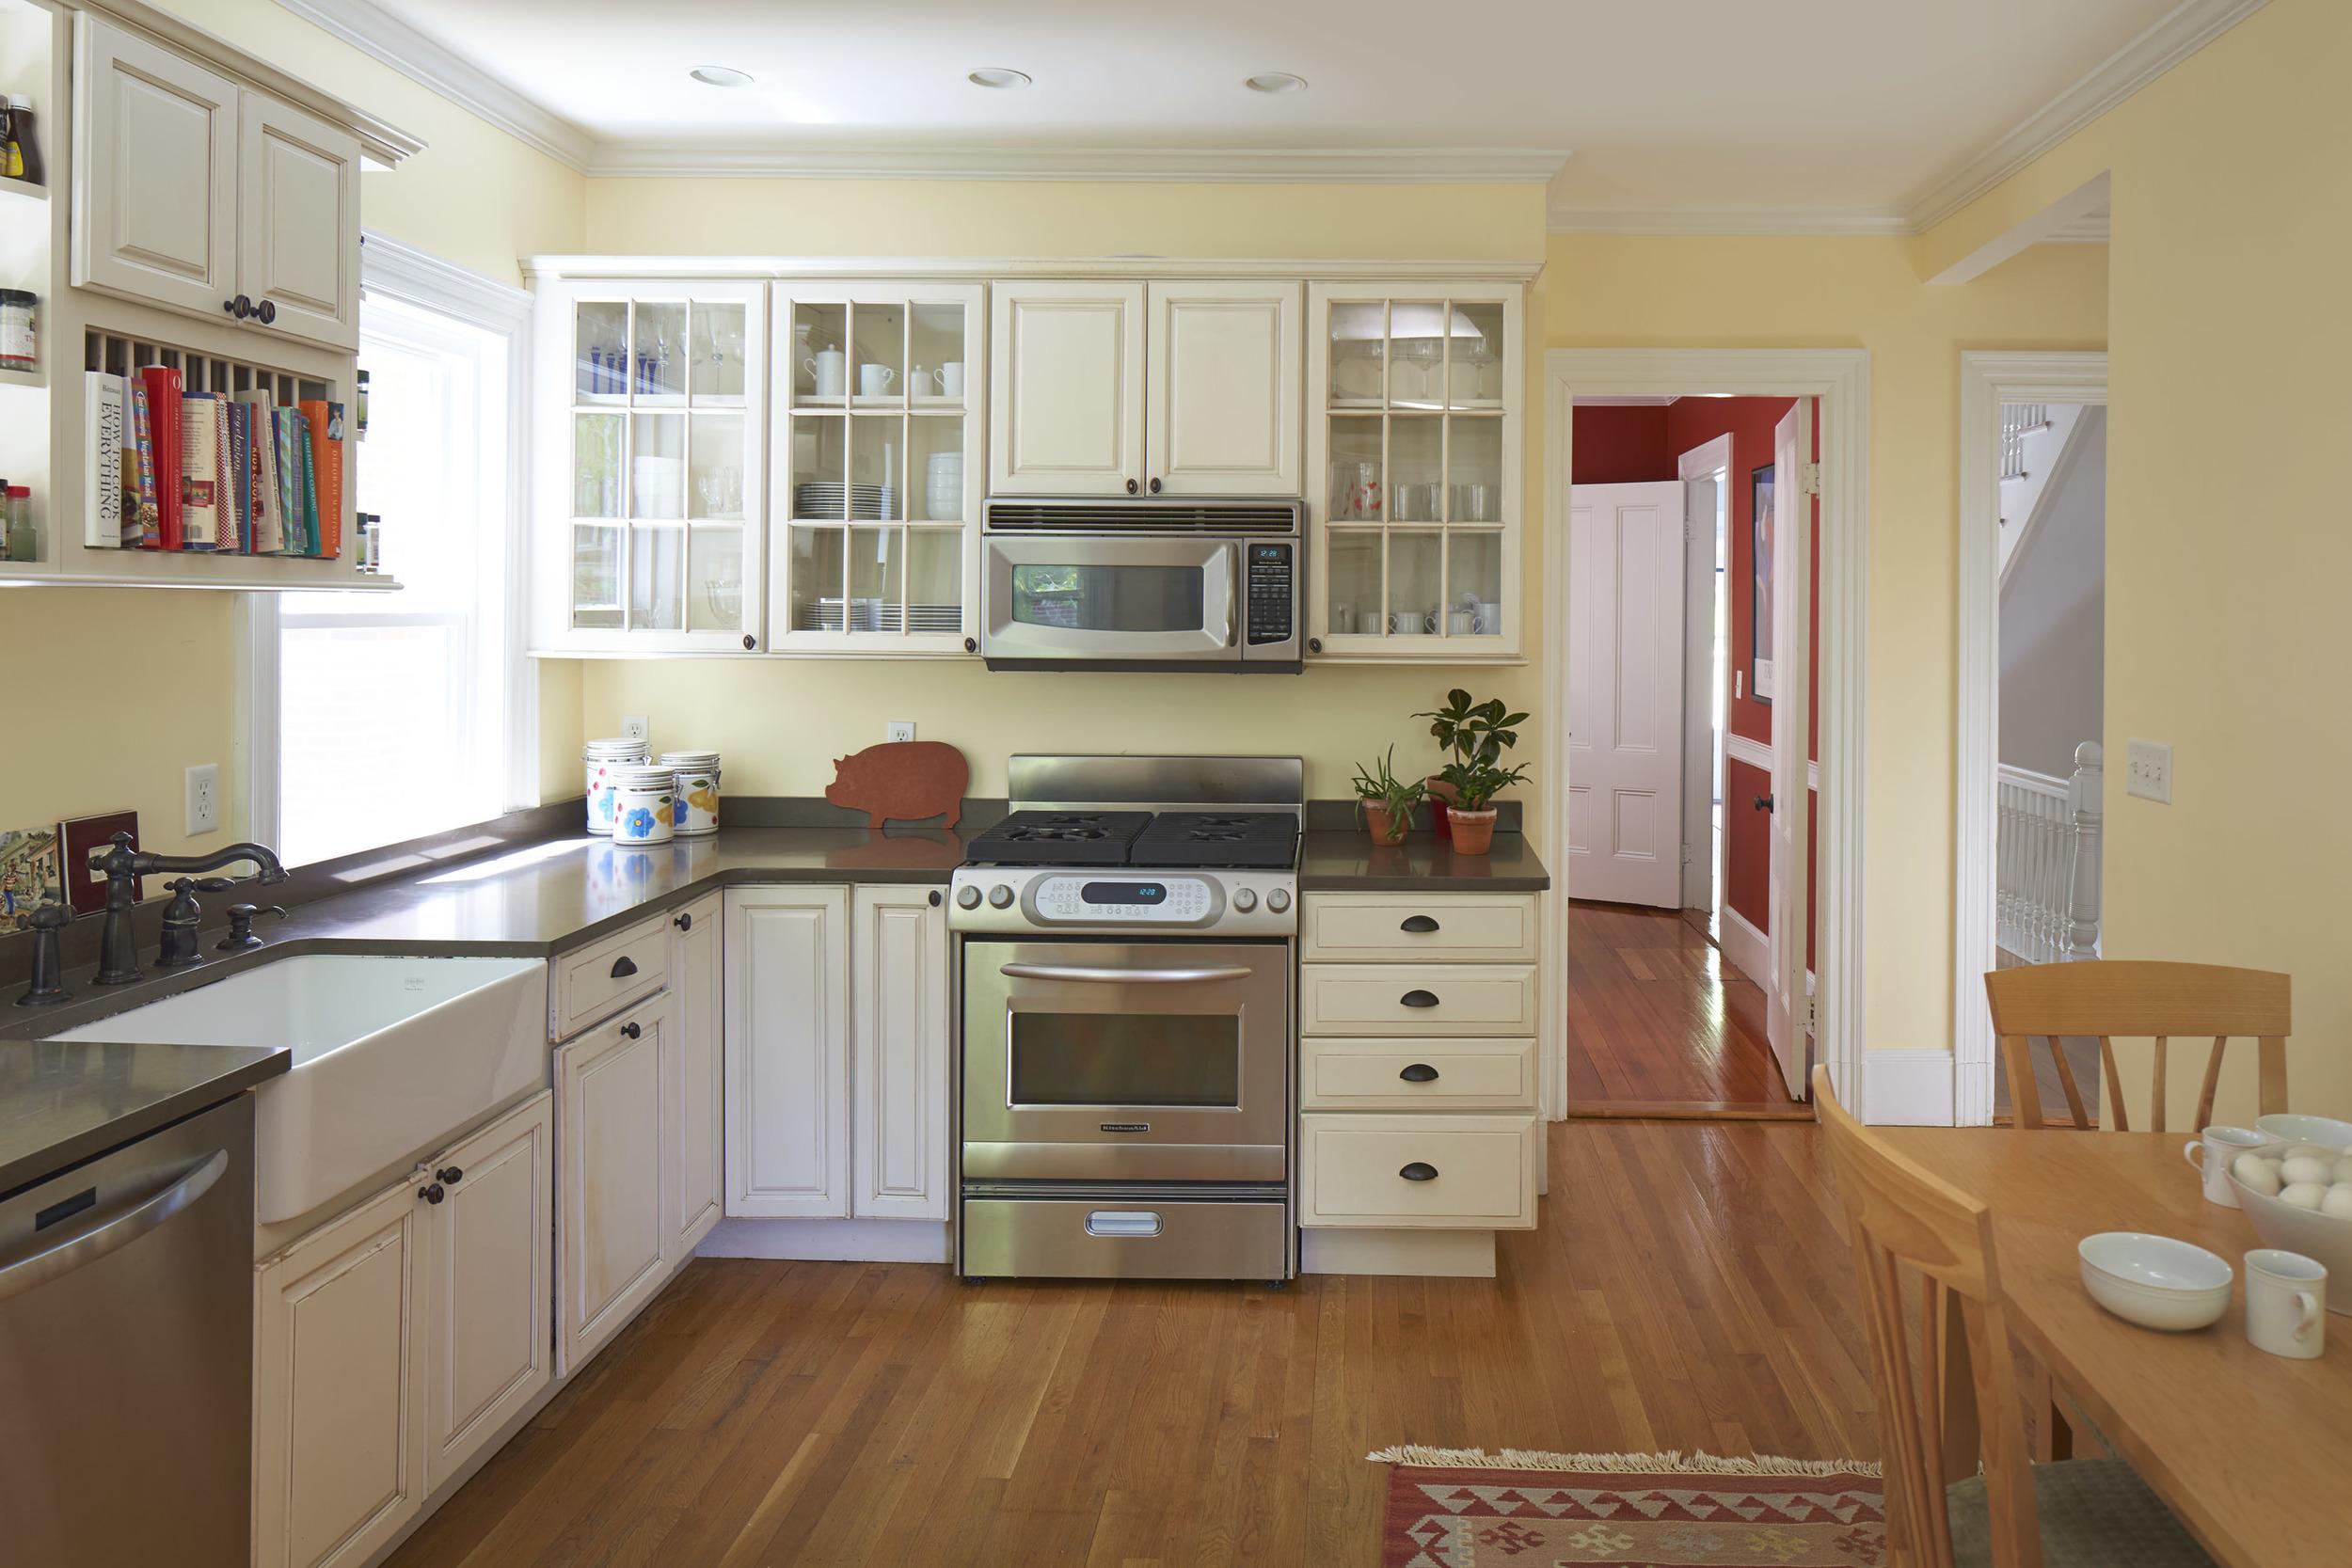 40_highland_ave_kitchen1.jpg